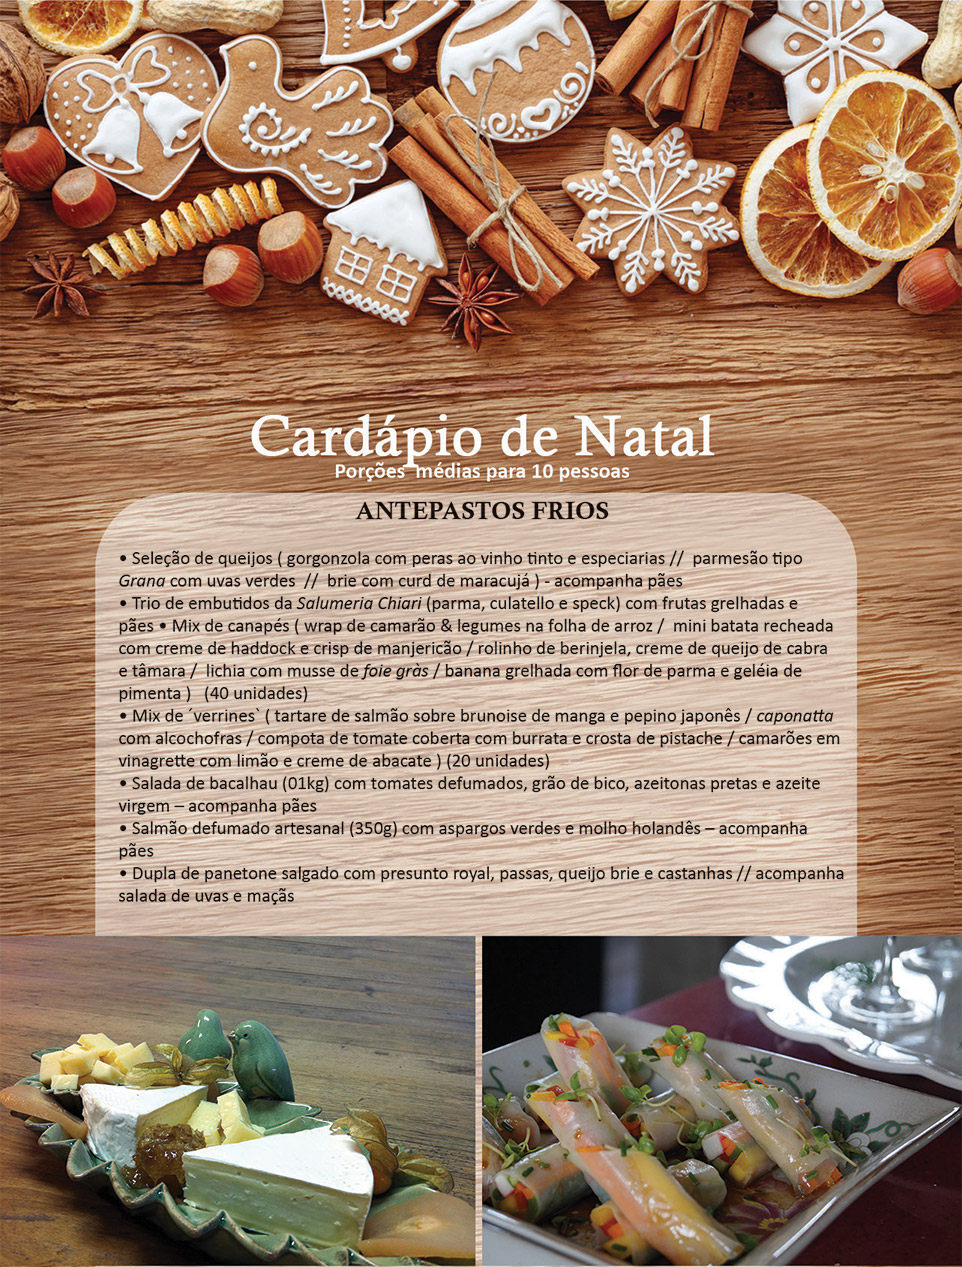 Cardápio de Natal - 2014